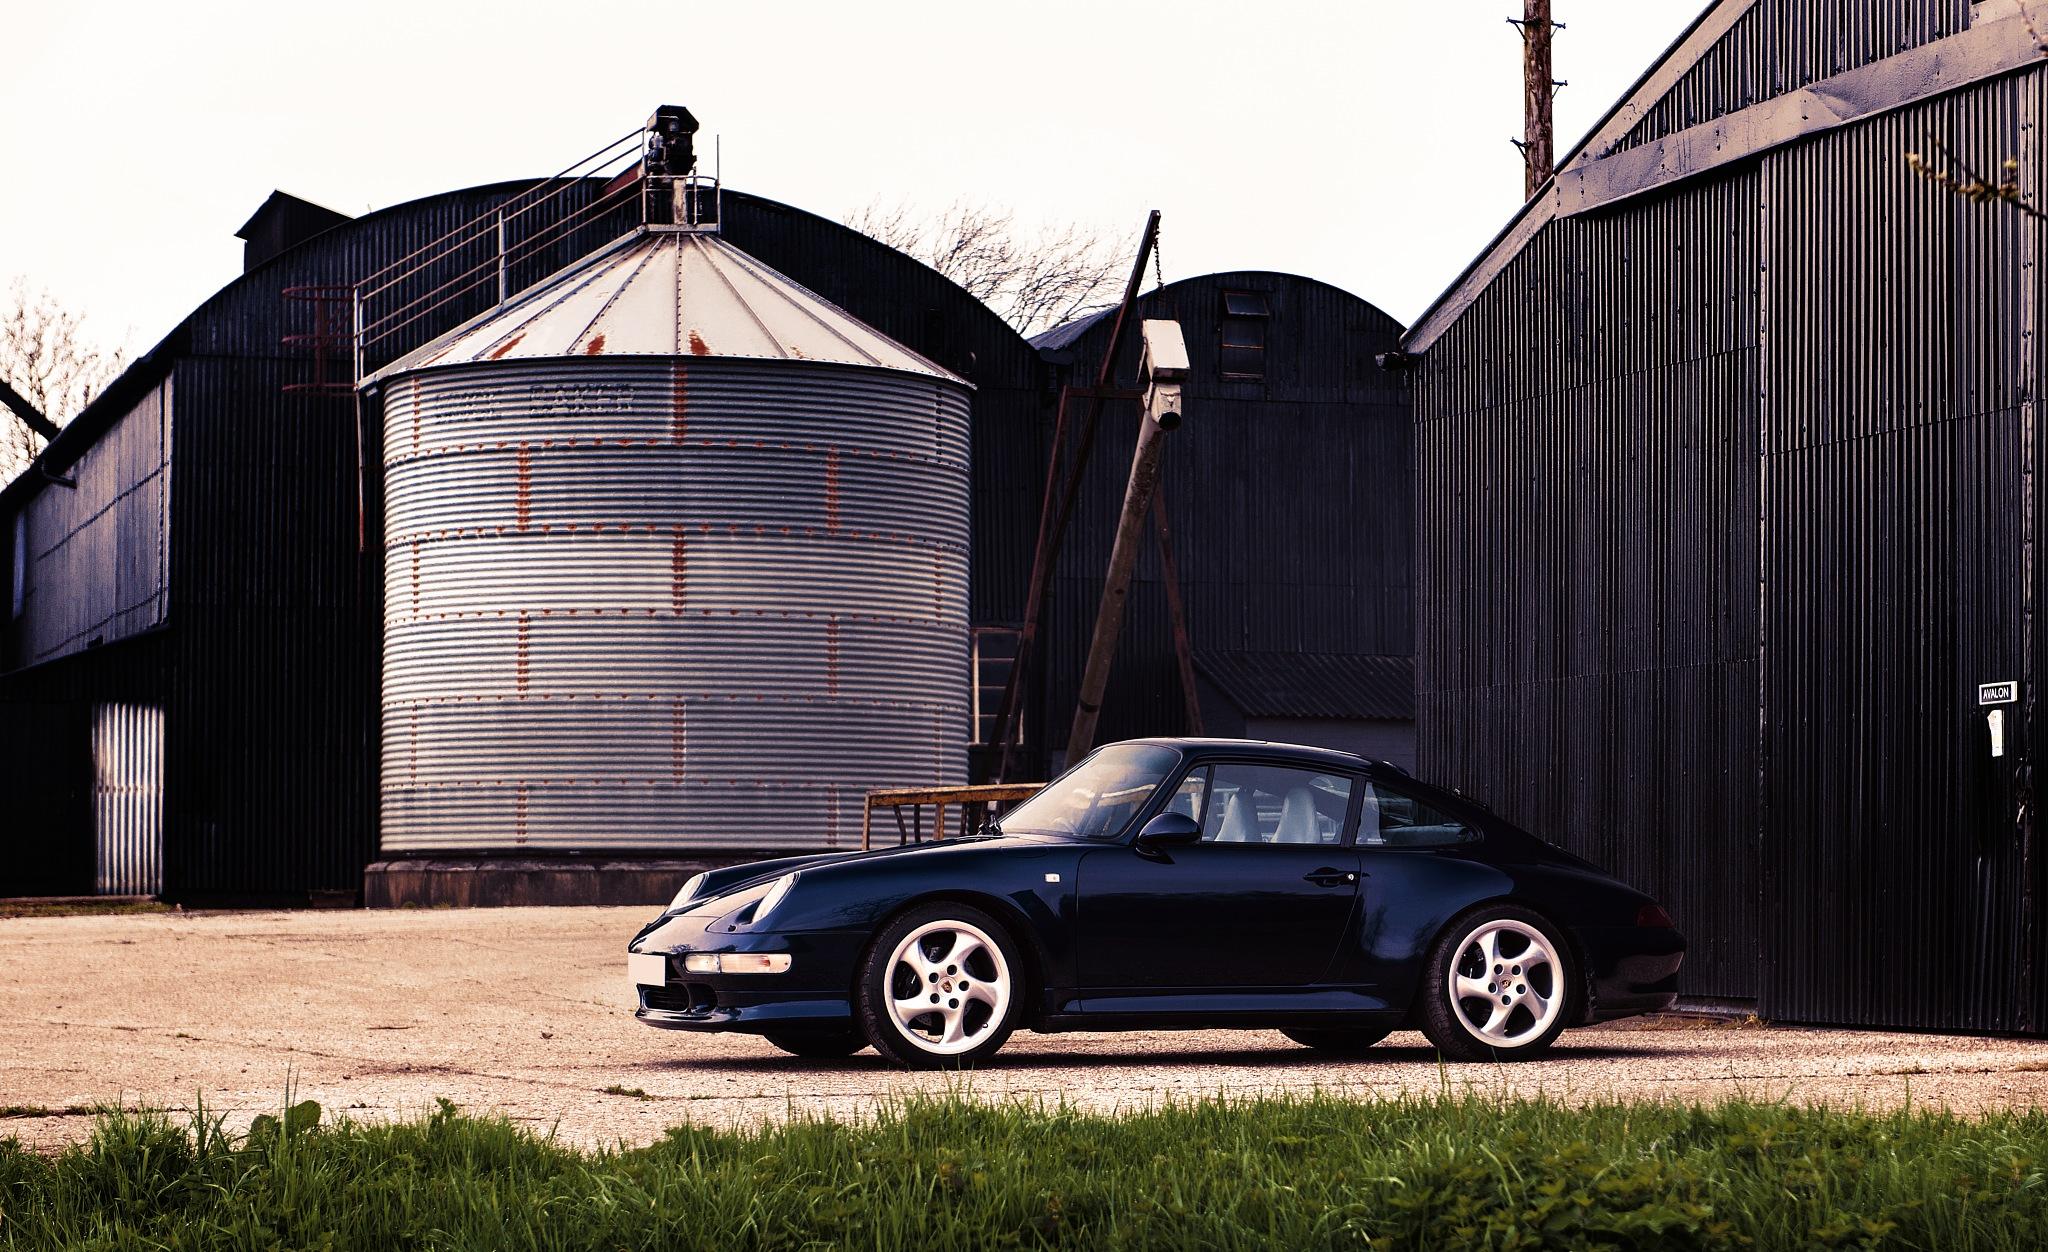 Porsche 993 by rogaragarza